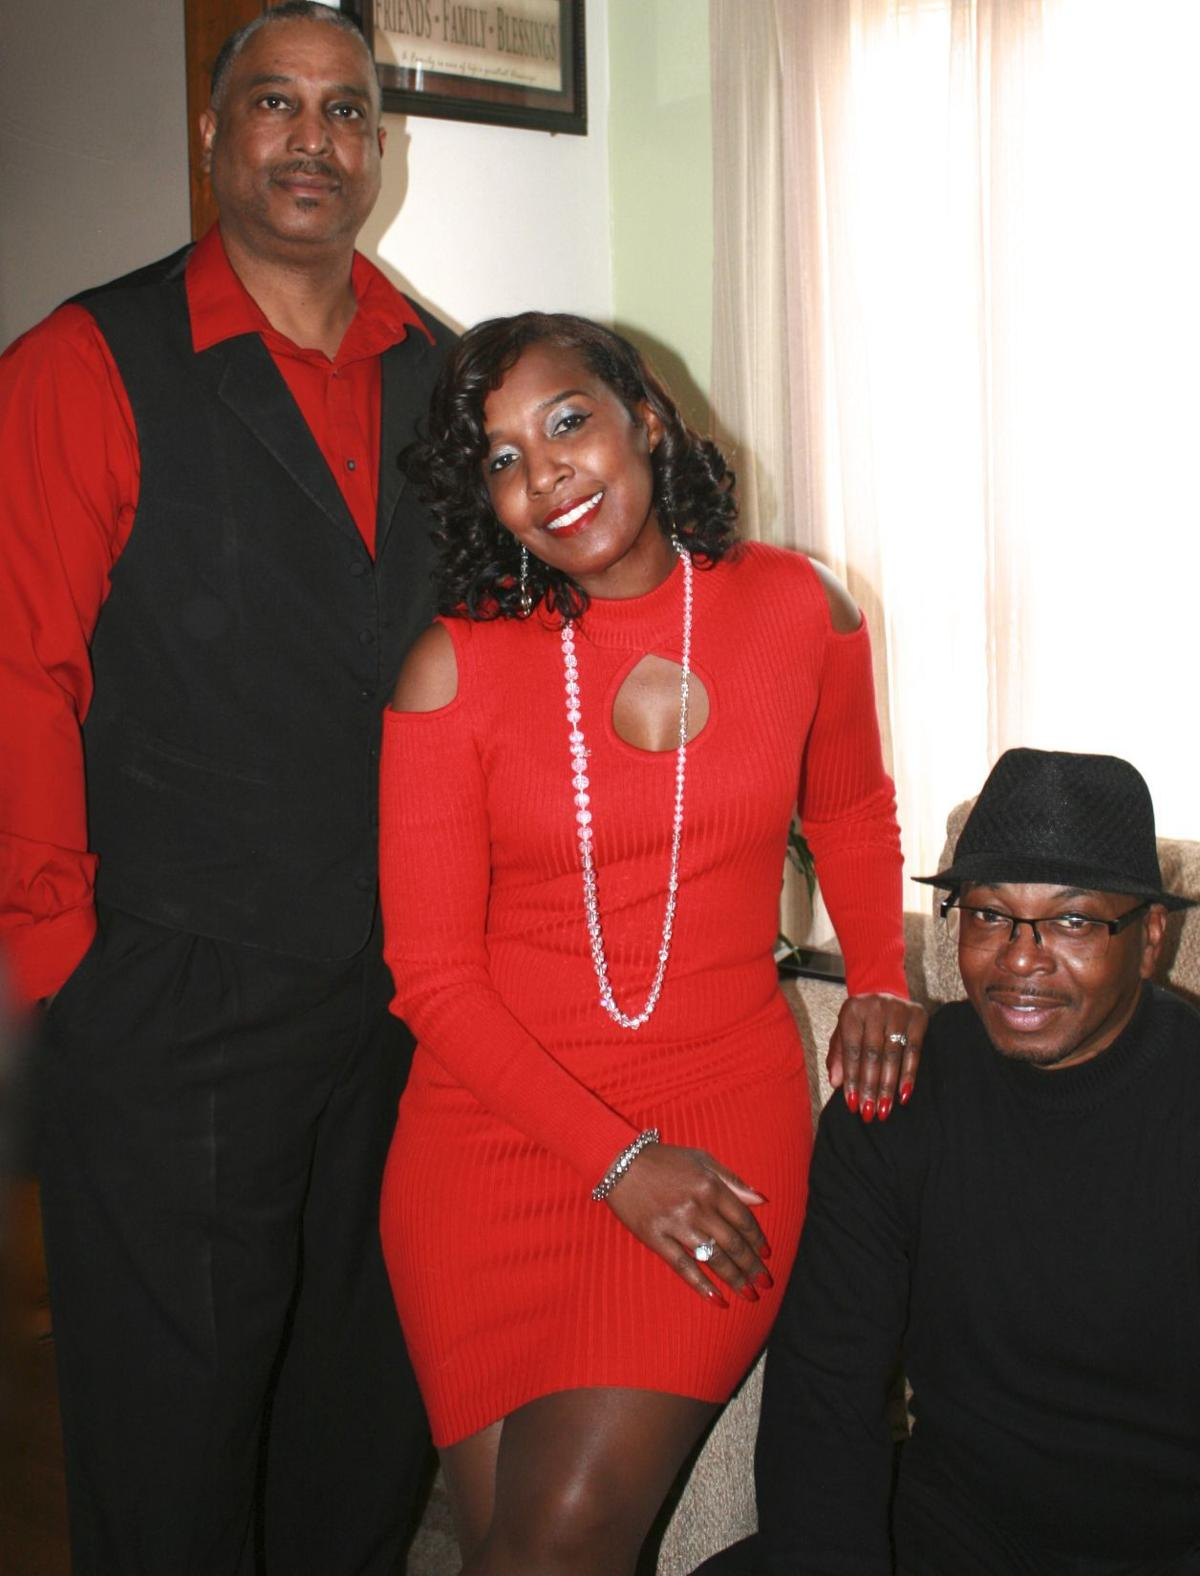 karla grase debuts original christmas songs with mprov trio at hampton history museum on dec - Original Christmas Songs